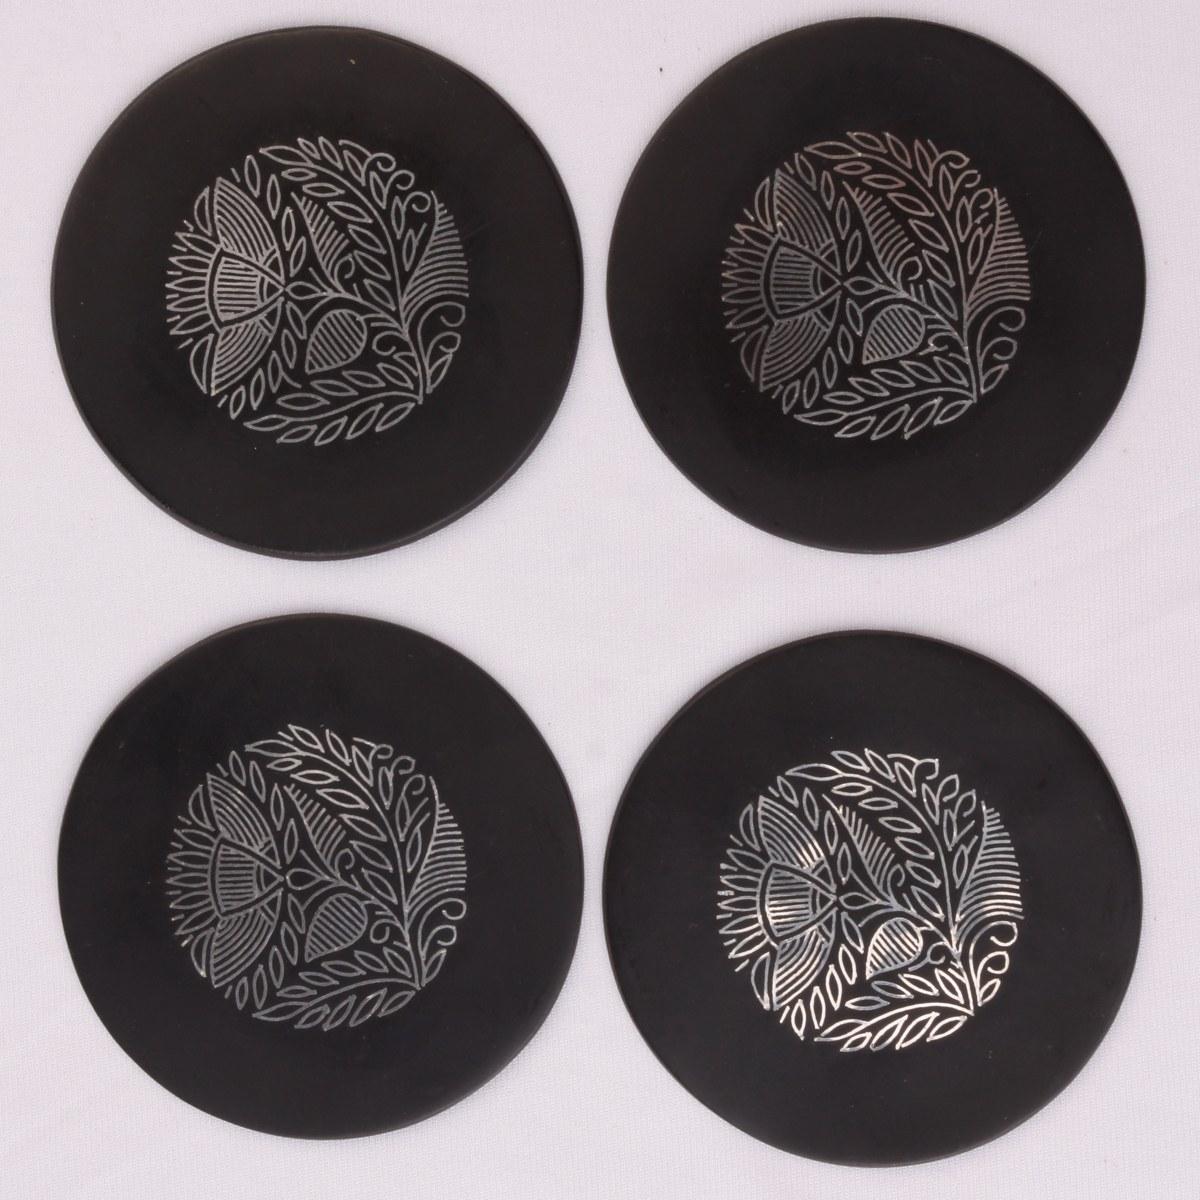 Desi Design Coasters Online Shopping  : HFPM00002312 from craftsvilla.com size 1200 x 1200 jpeg 245kB